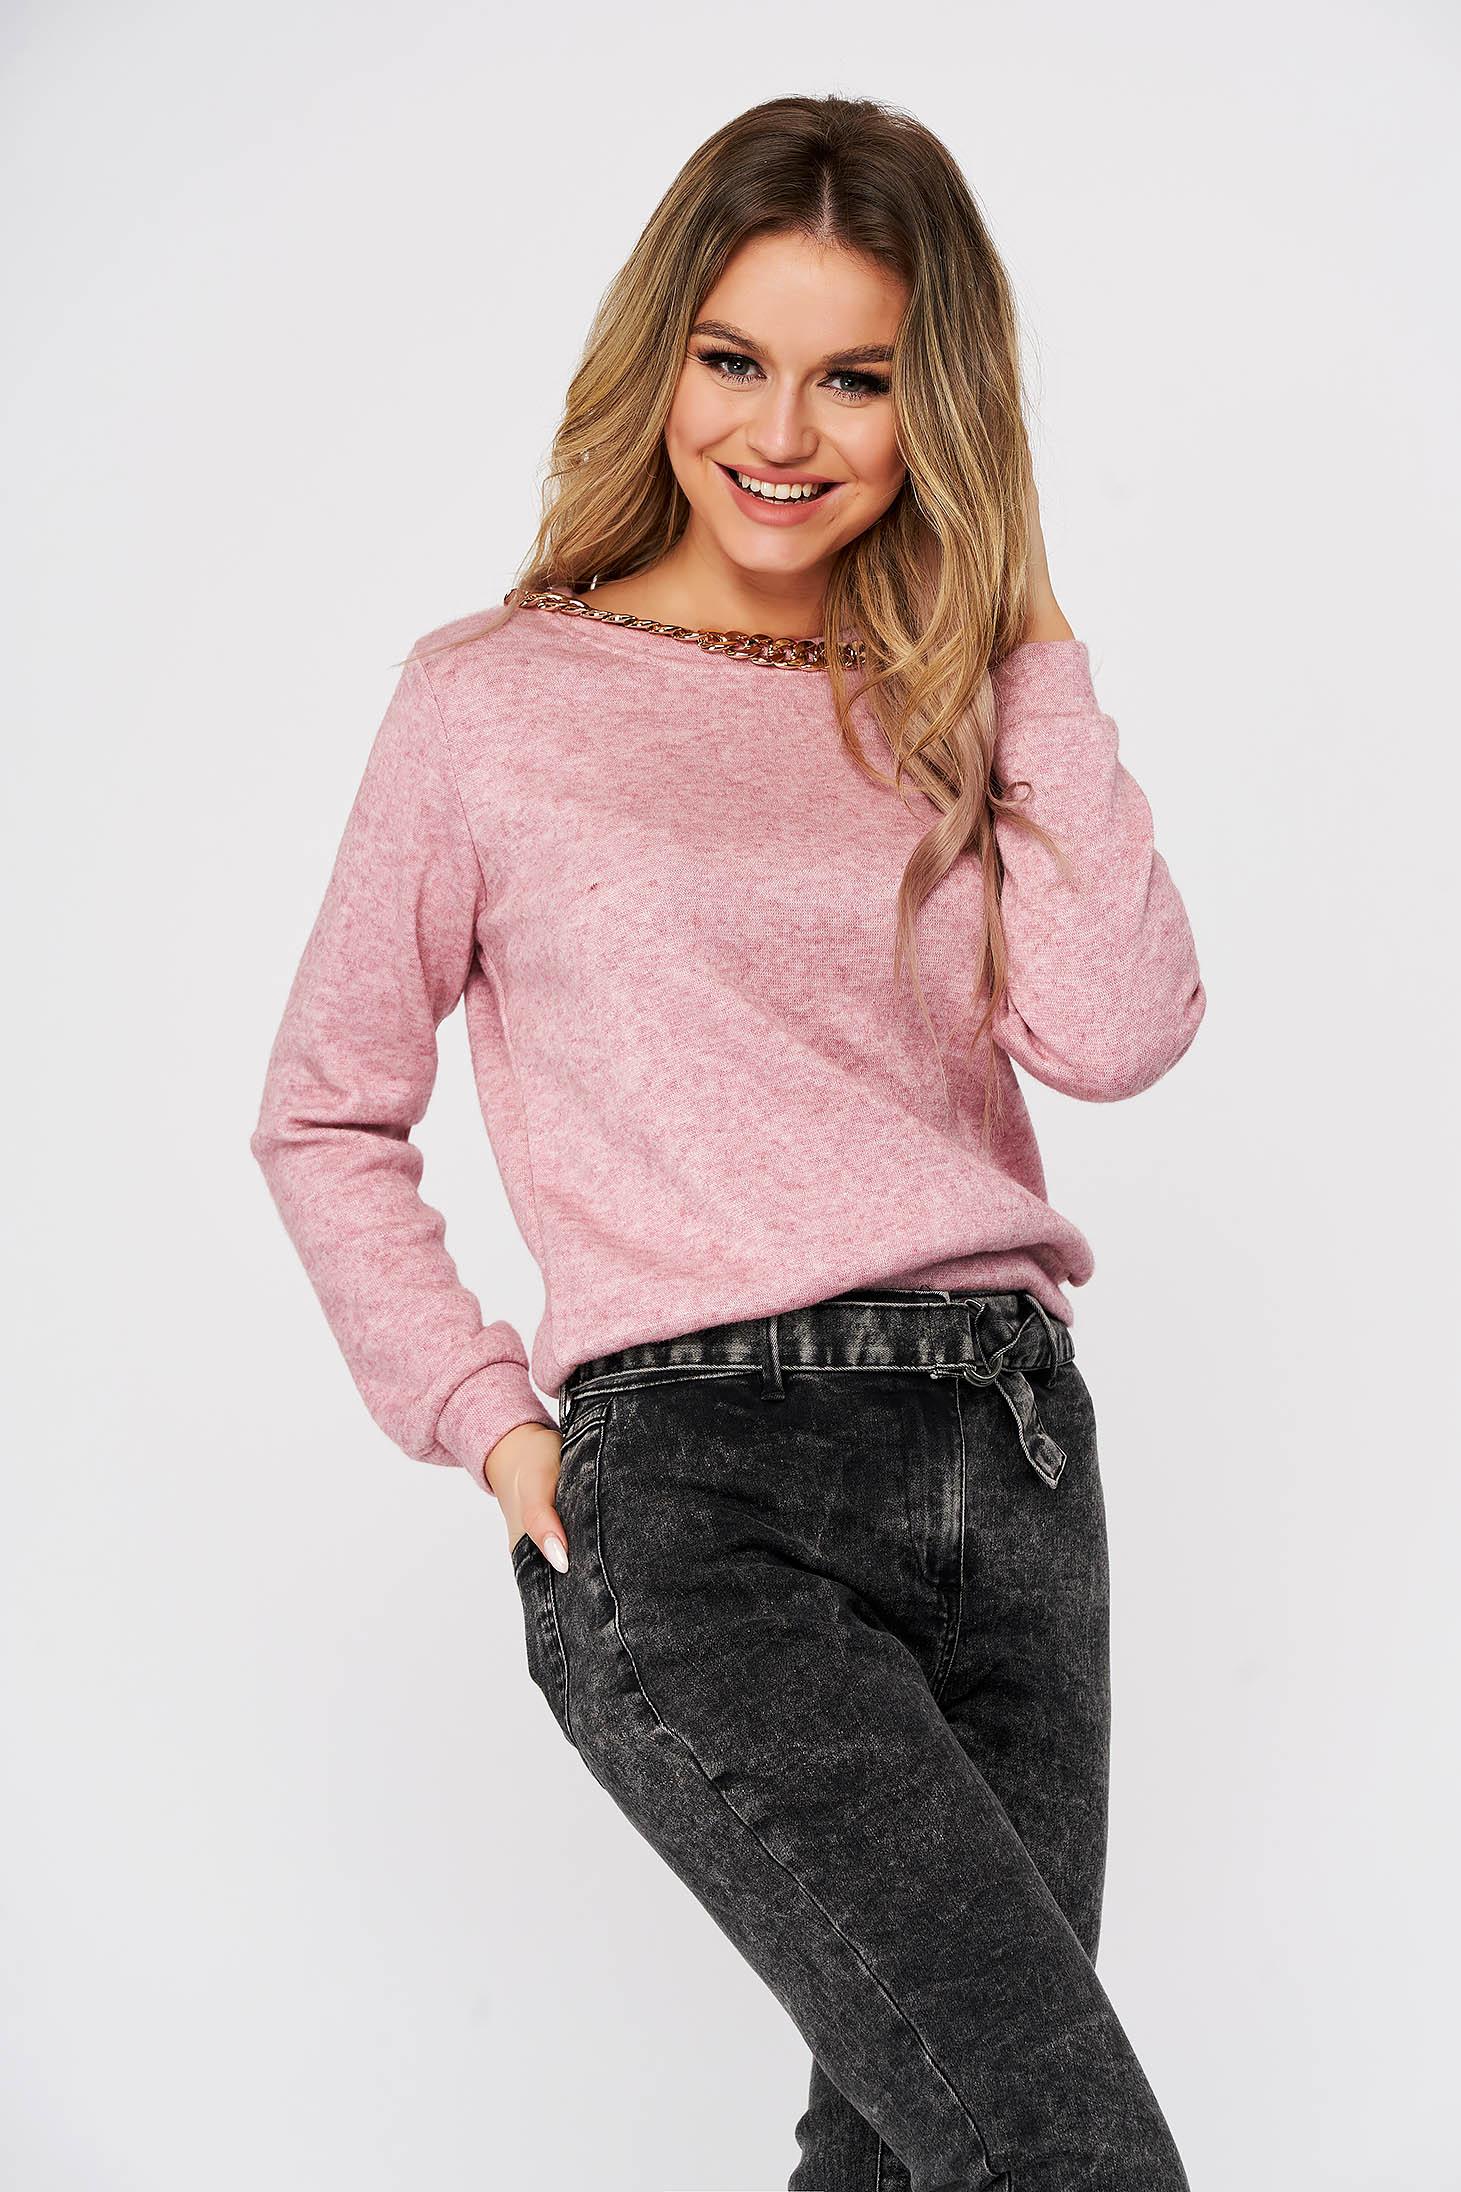 Pink sweater neckline metallic chain accessory